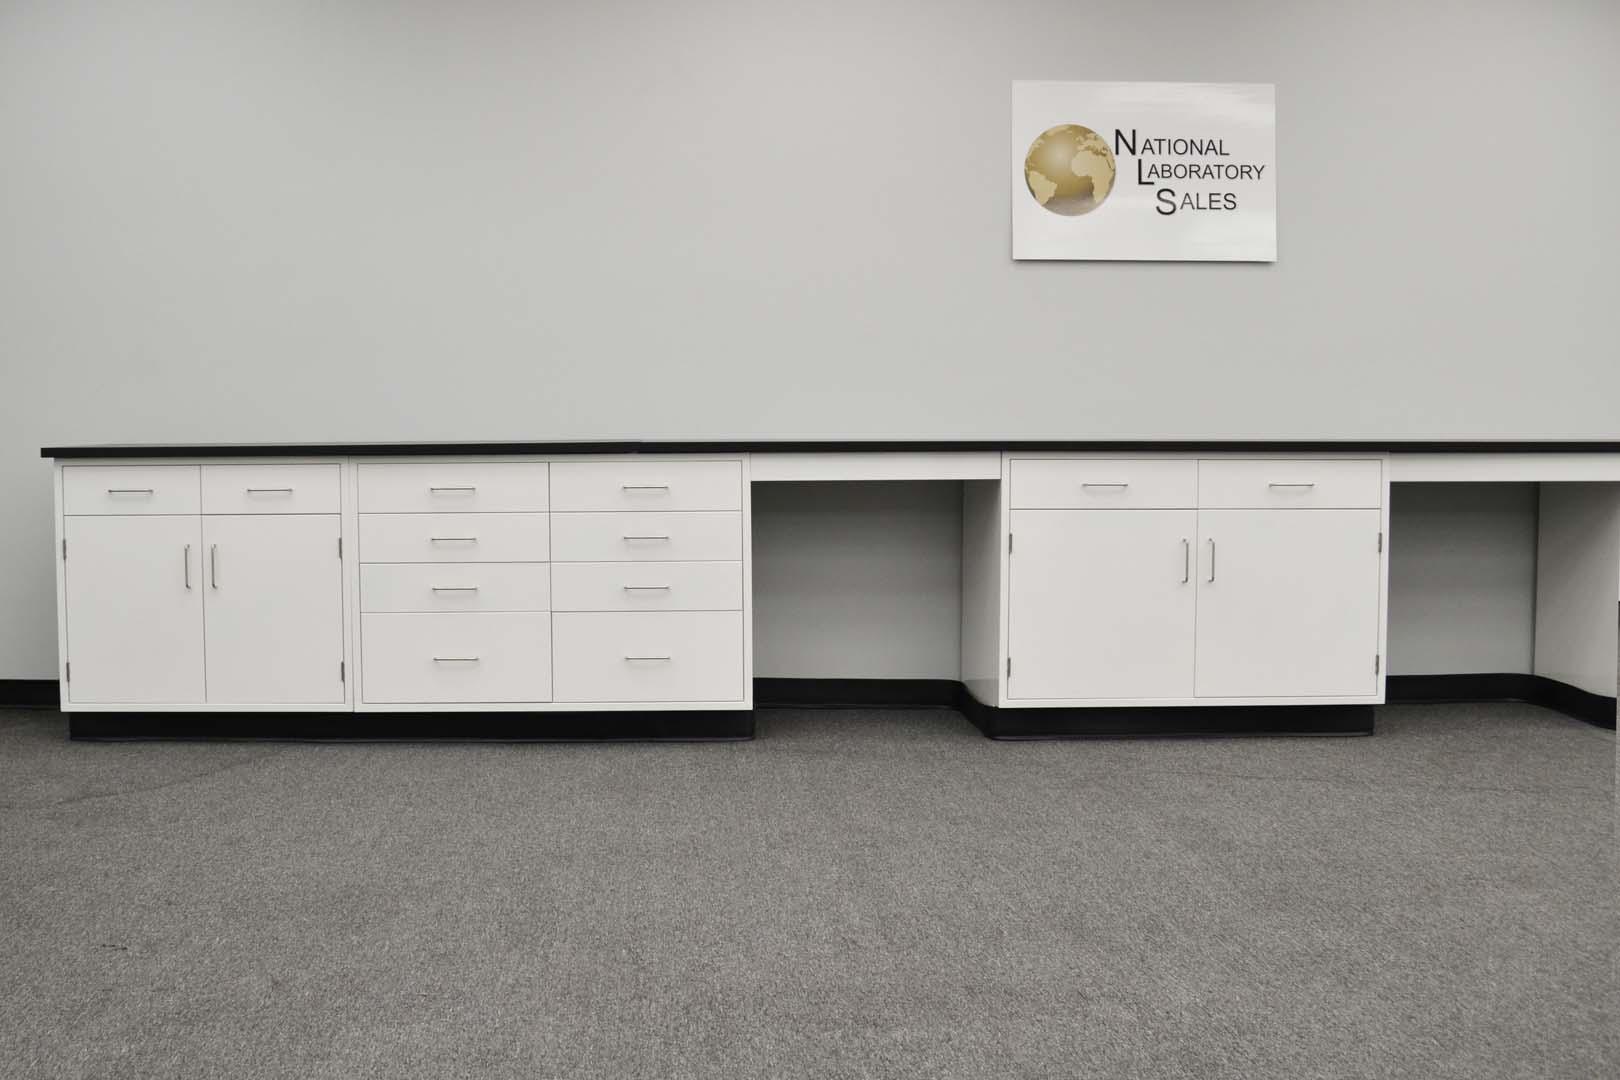 Awesome Fisher Cabinets #21 - 22u2032 X 15u2032 Fisher American Base Laboratory Cabinets With Desks